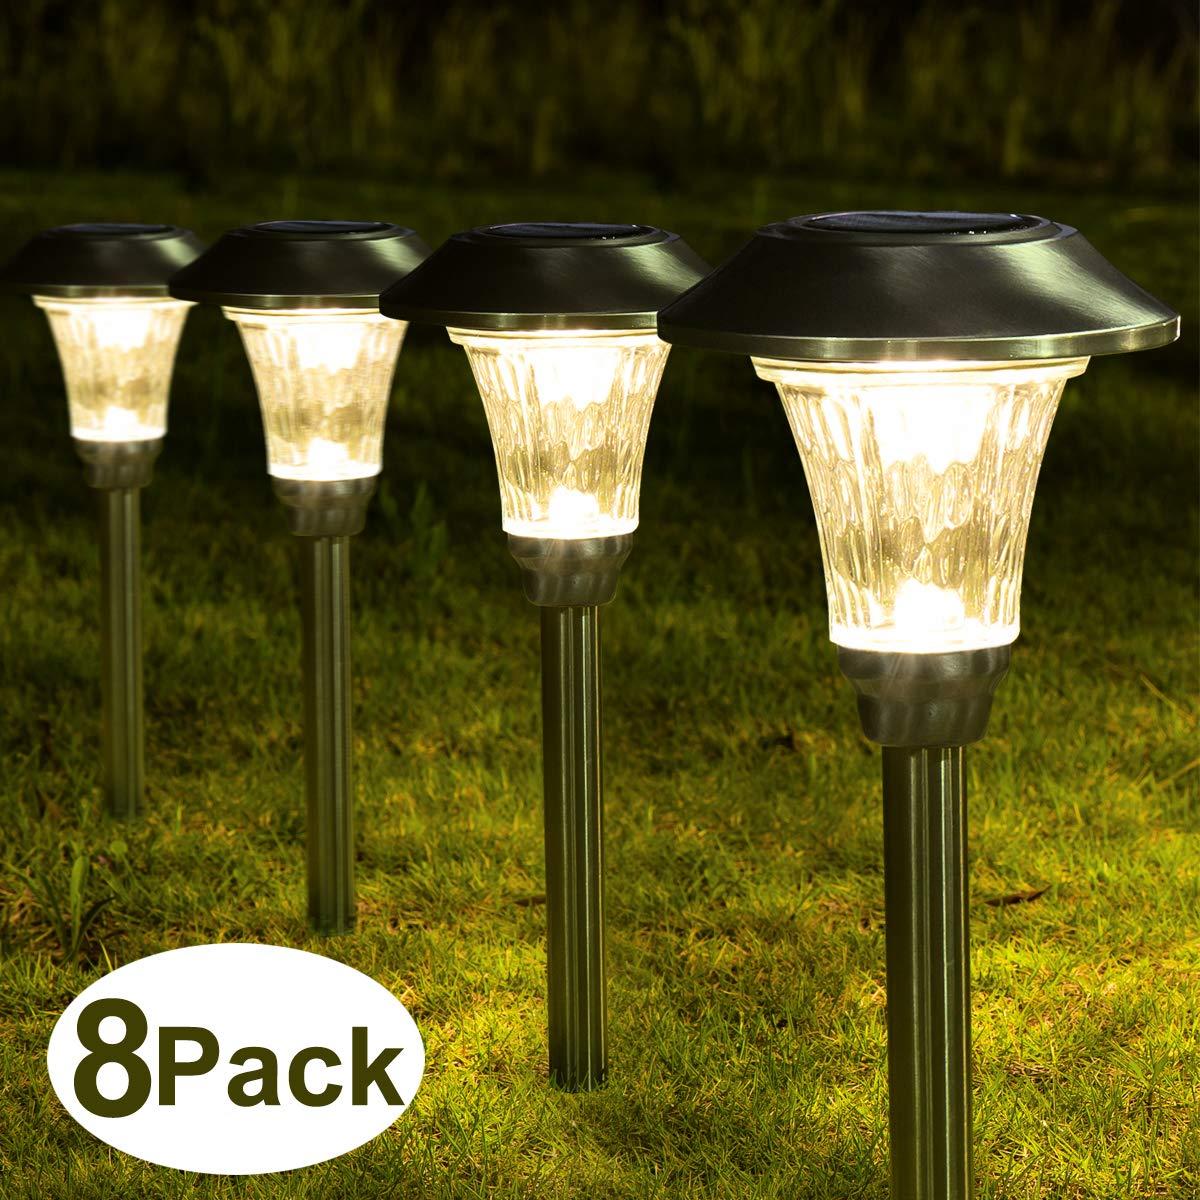 Diamond-shaped lamp with solar energy outdoor waterproof LED landscape lighting for garden, patio, lawn, patio, sidewalk